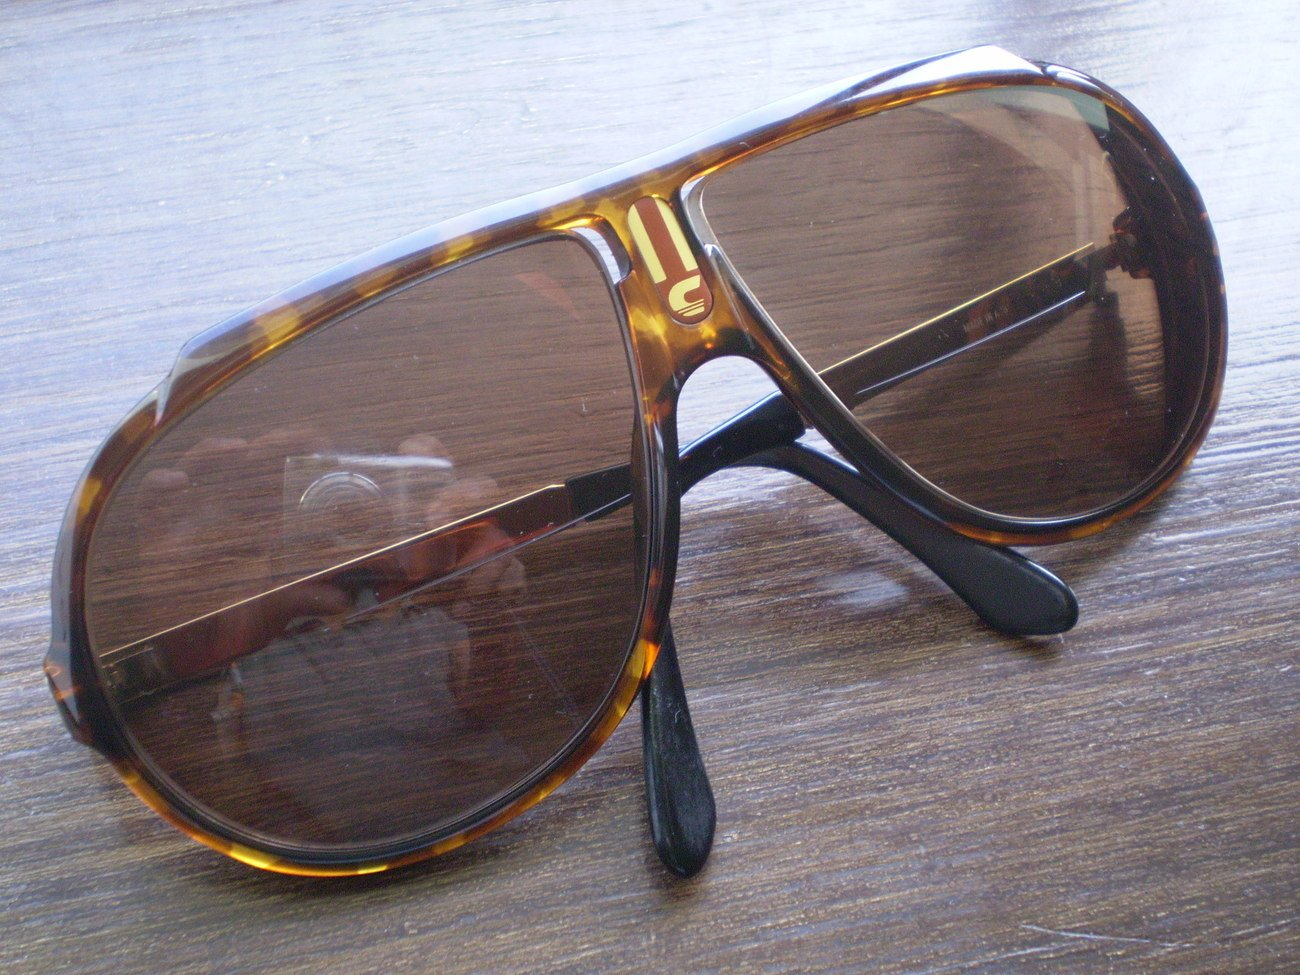 Vintage Carrera Aviator Sunglasses Tortoise Shell Brown Eyeglasses Shades